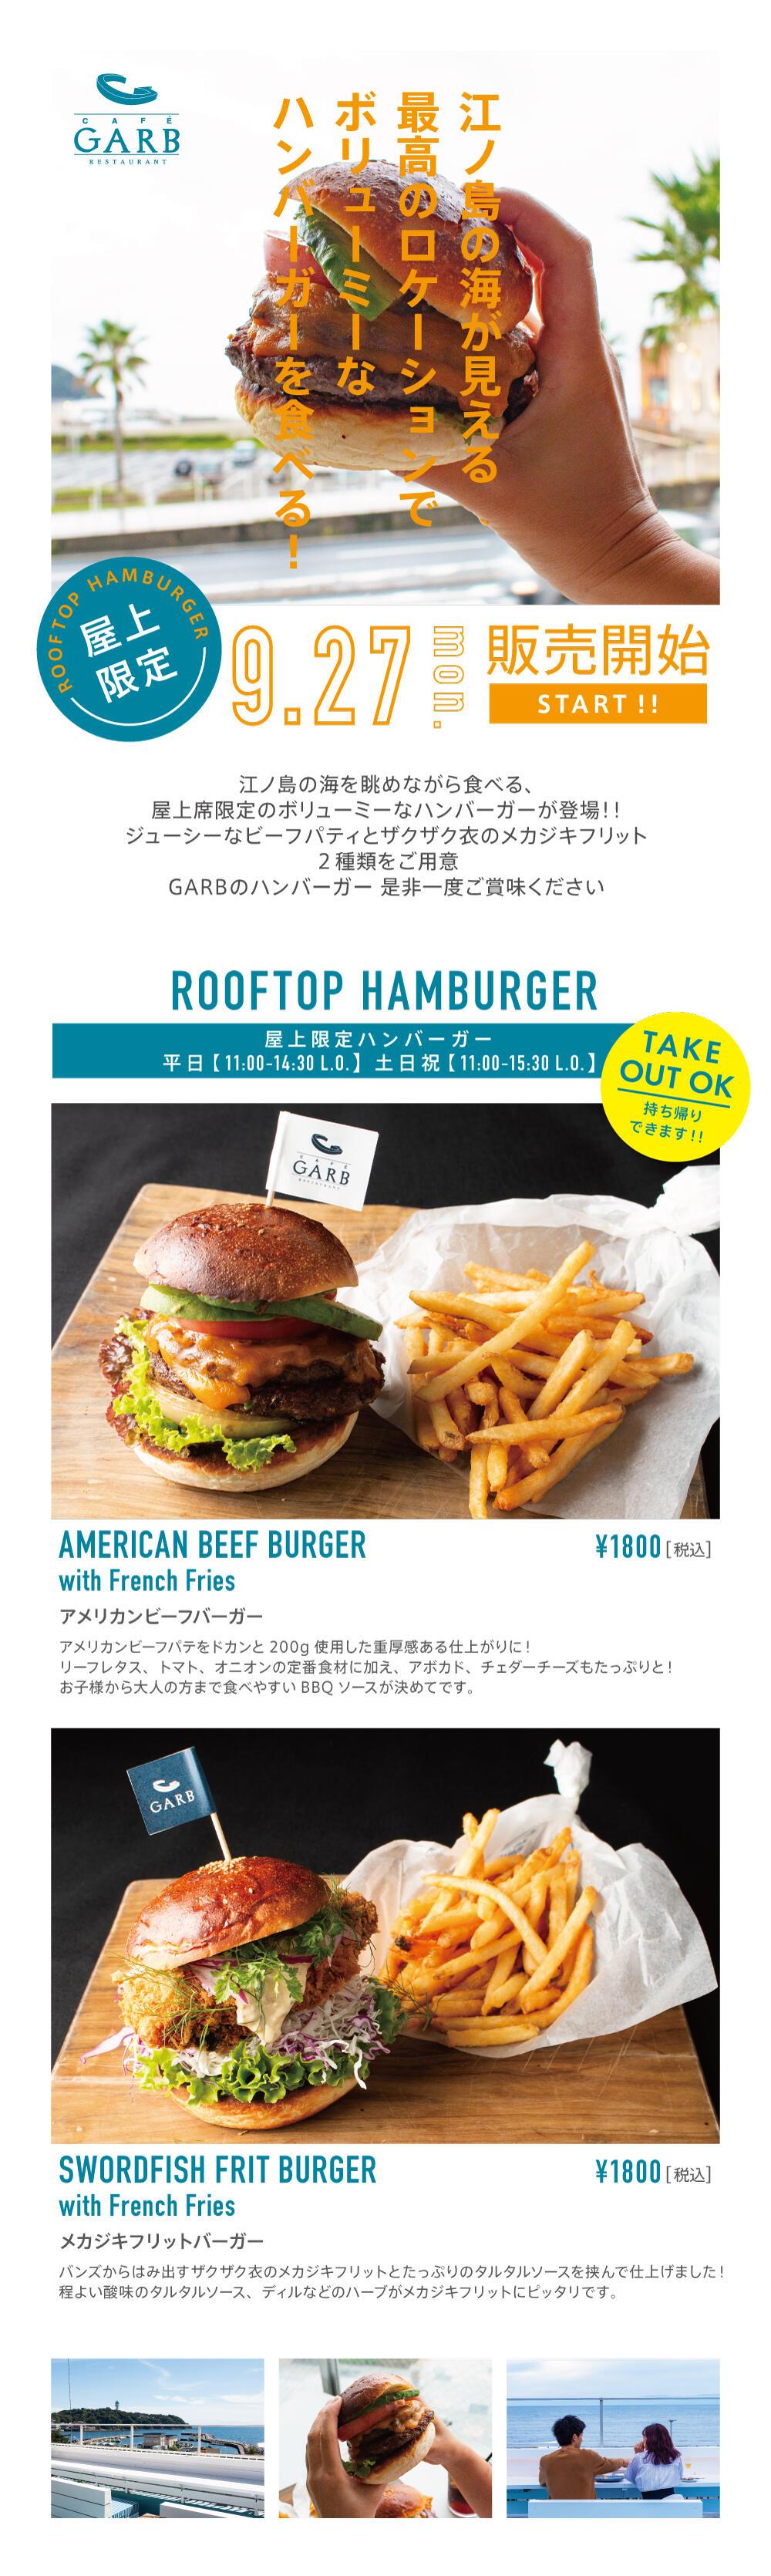 ge_cg_210915_burger.jpg